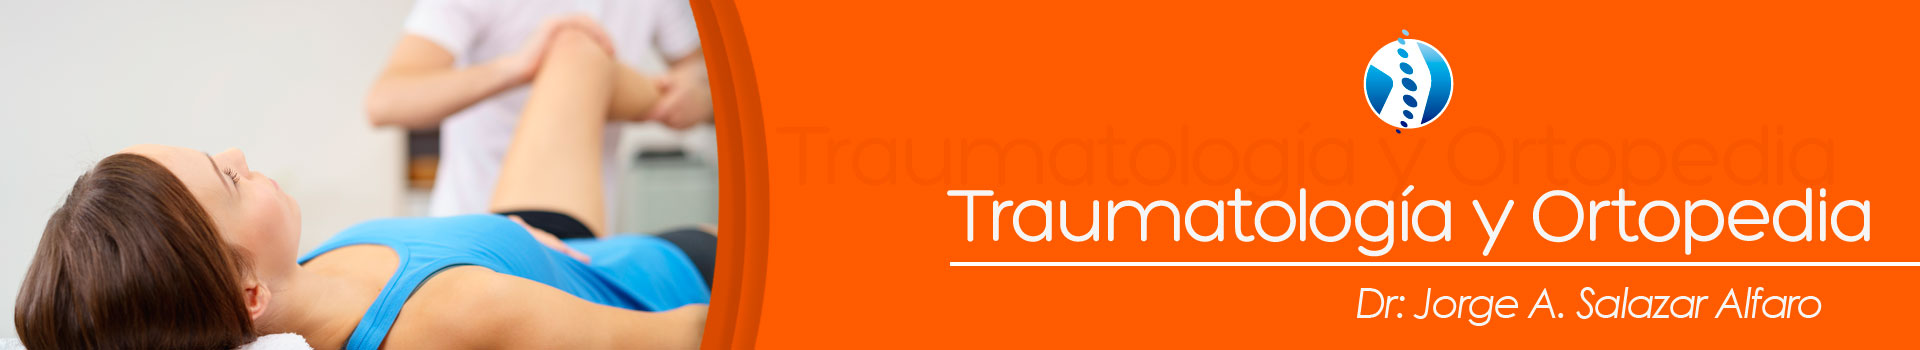 banner-traumatologia-y-ortopedia